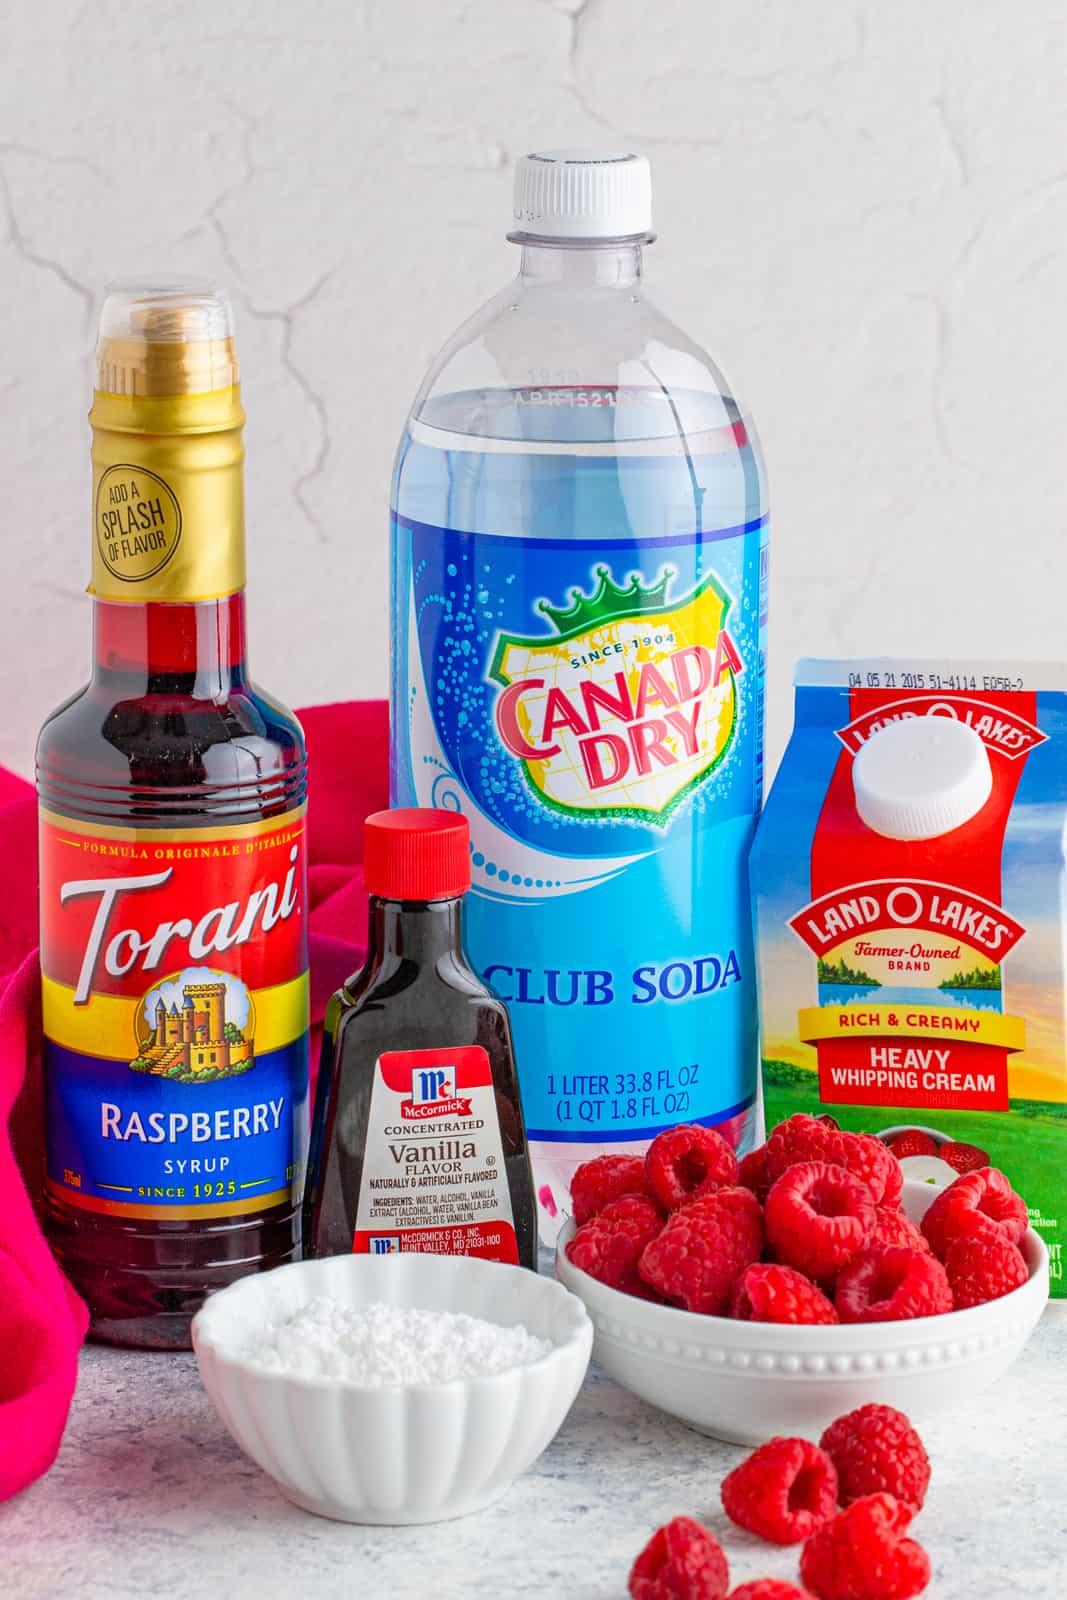 Ingredients needed to make Raspberry Italian Soda